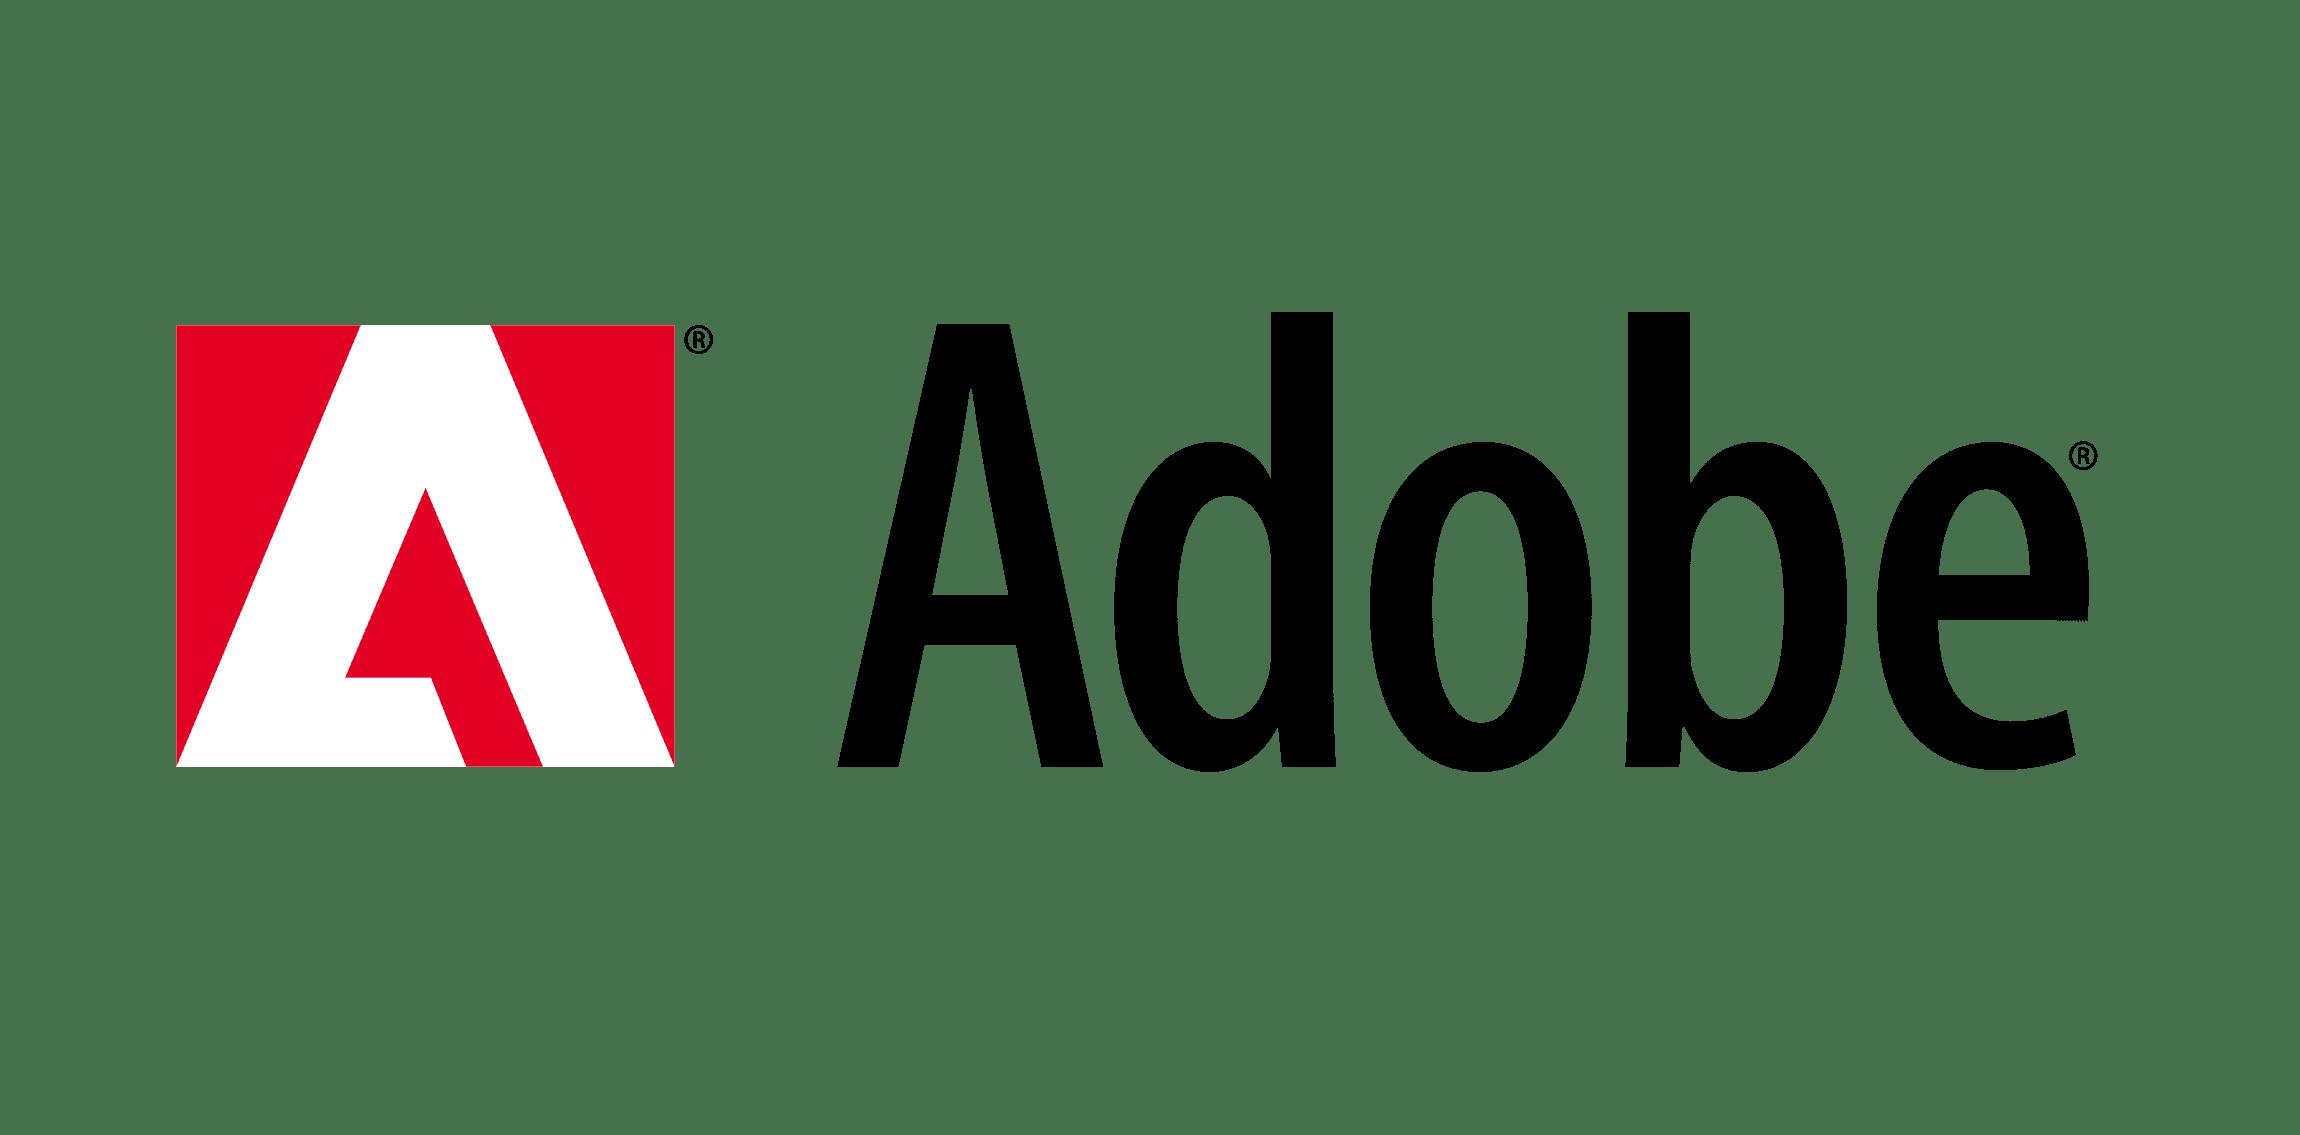 Adobe communications